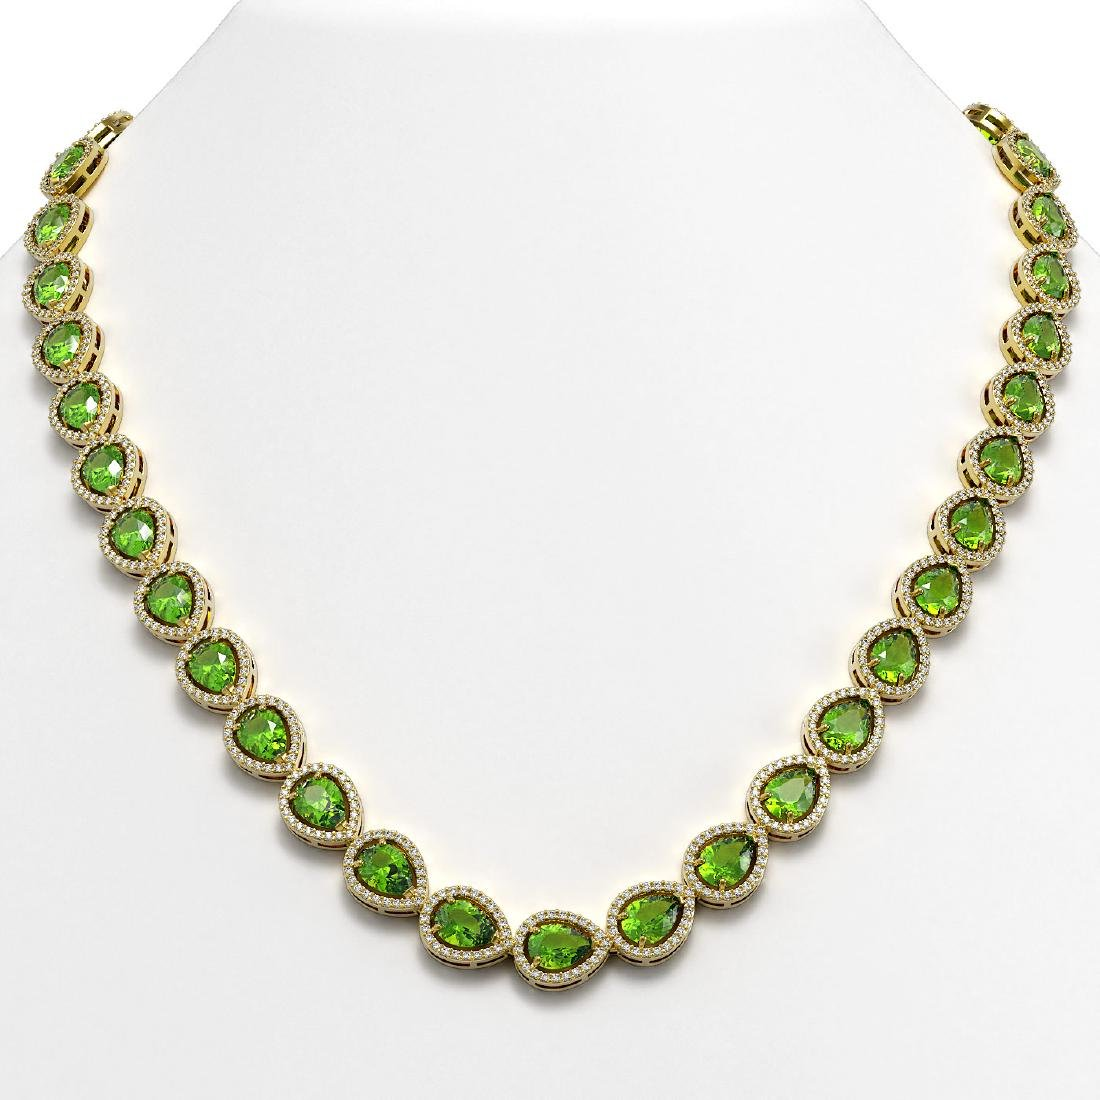 33.35 CTW Peridot & Diamond Halo Necklace 10K Yellow